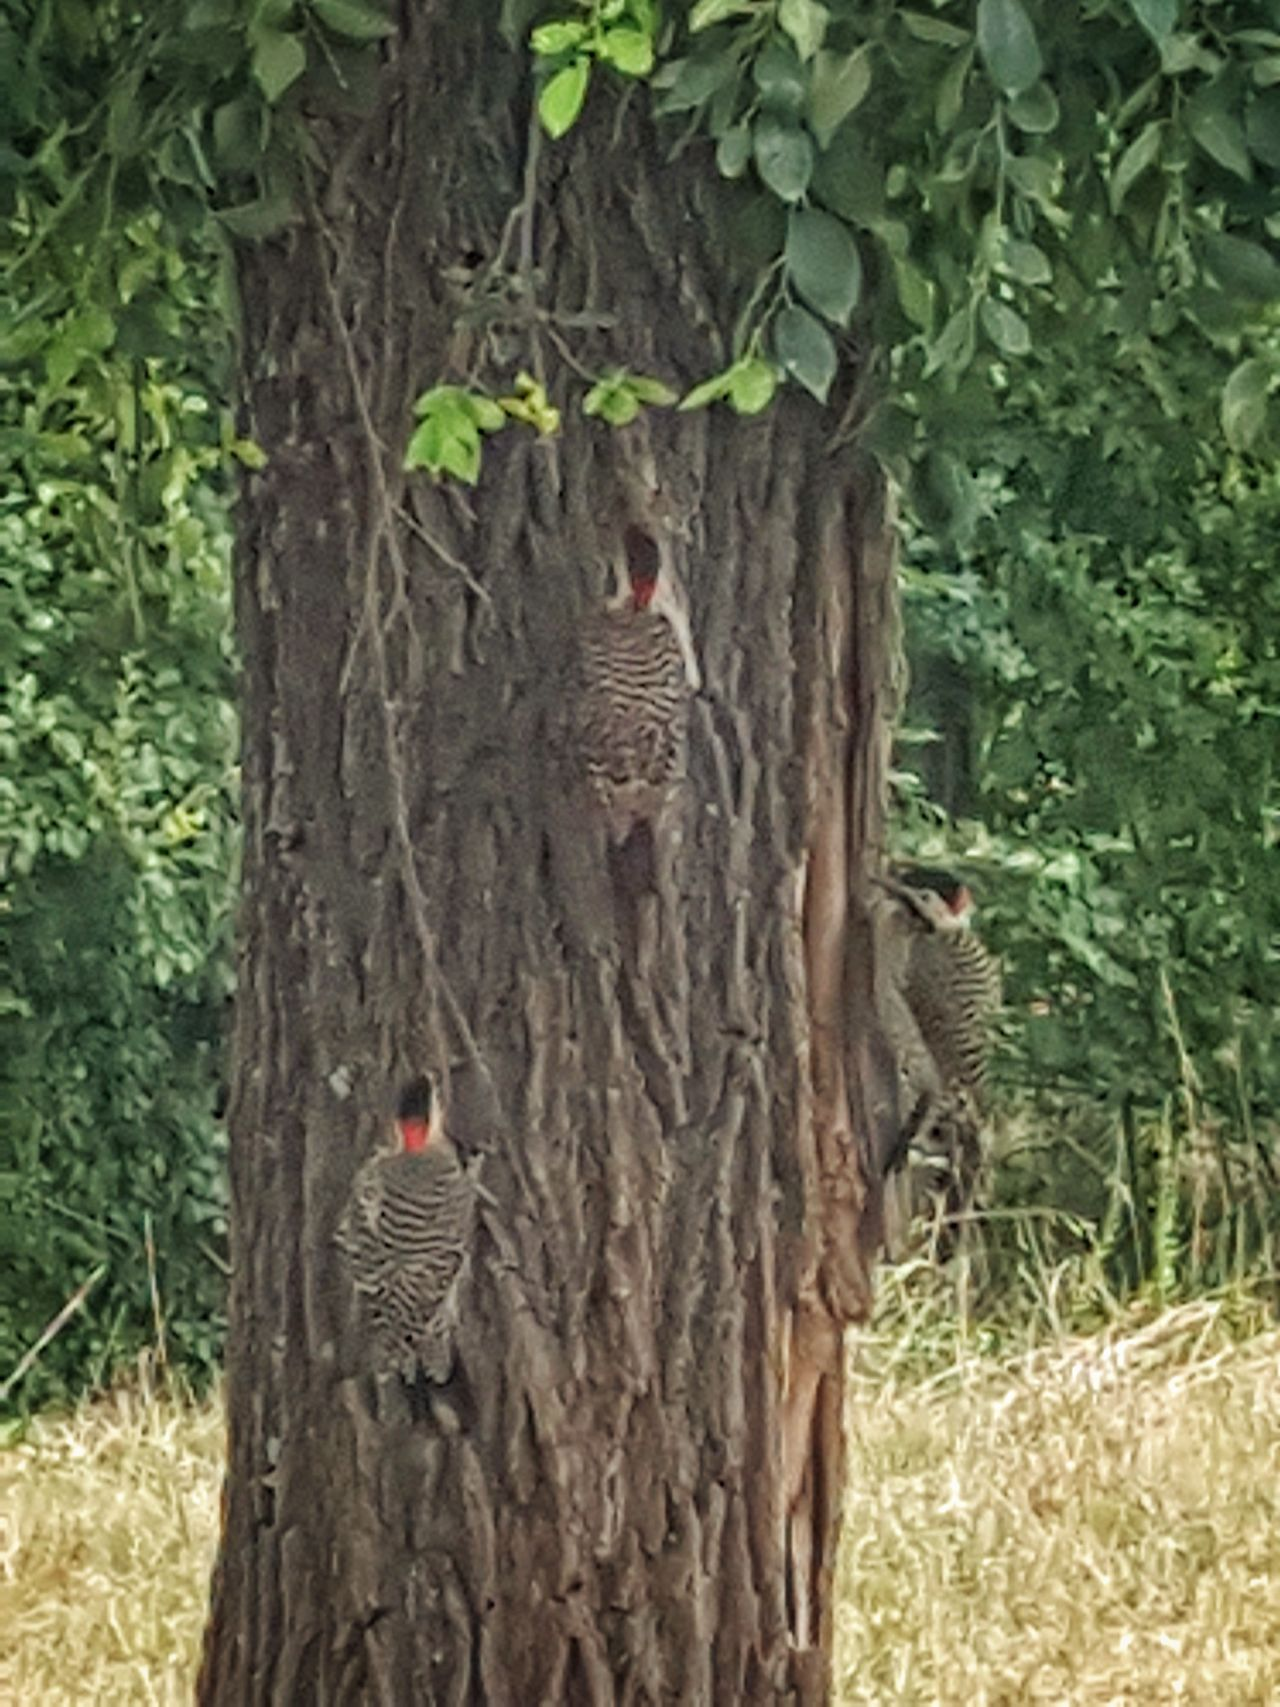 Birds Pajaro Carpintero Naturaleza Aves Bird Observation Trees Wild Life Work Carpinteros